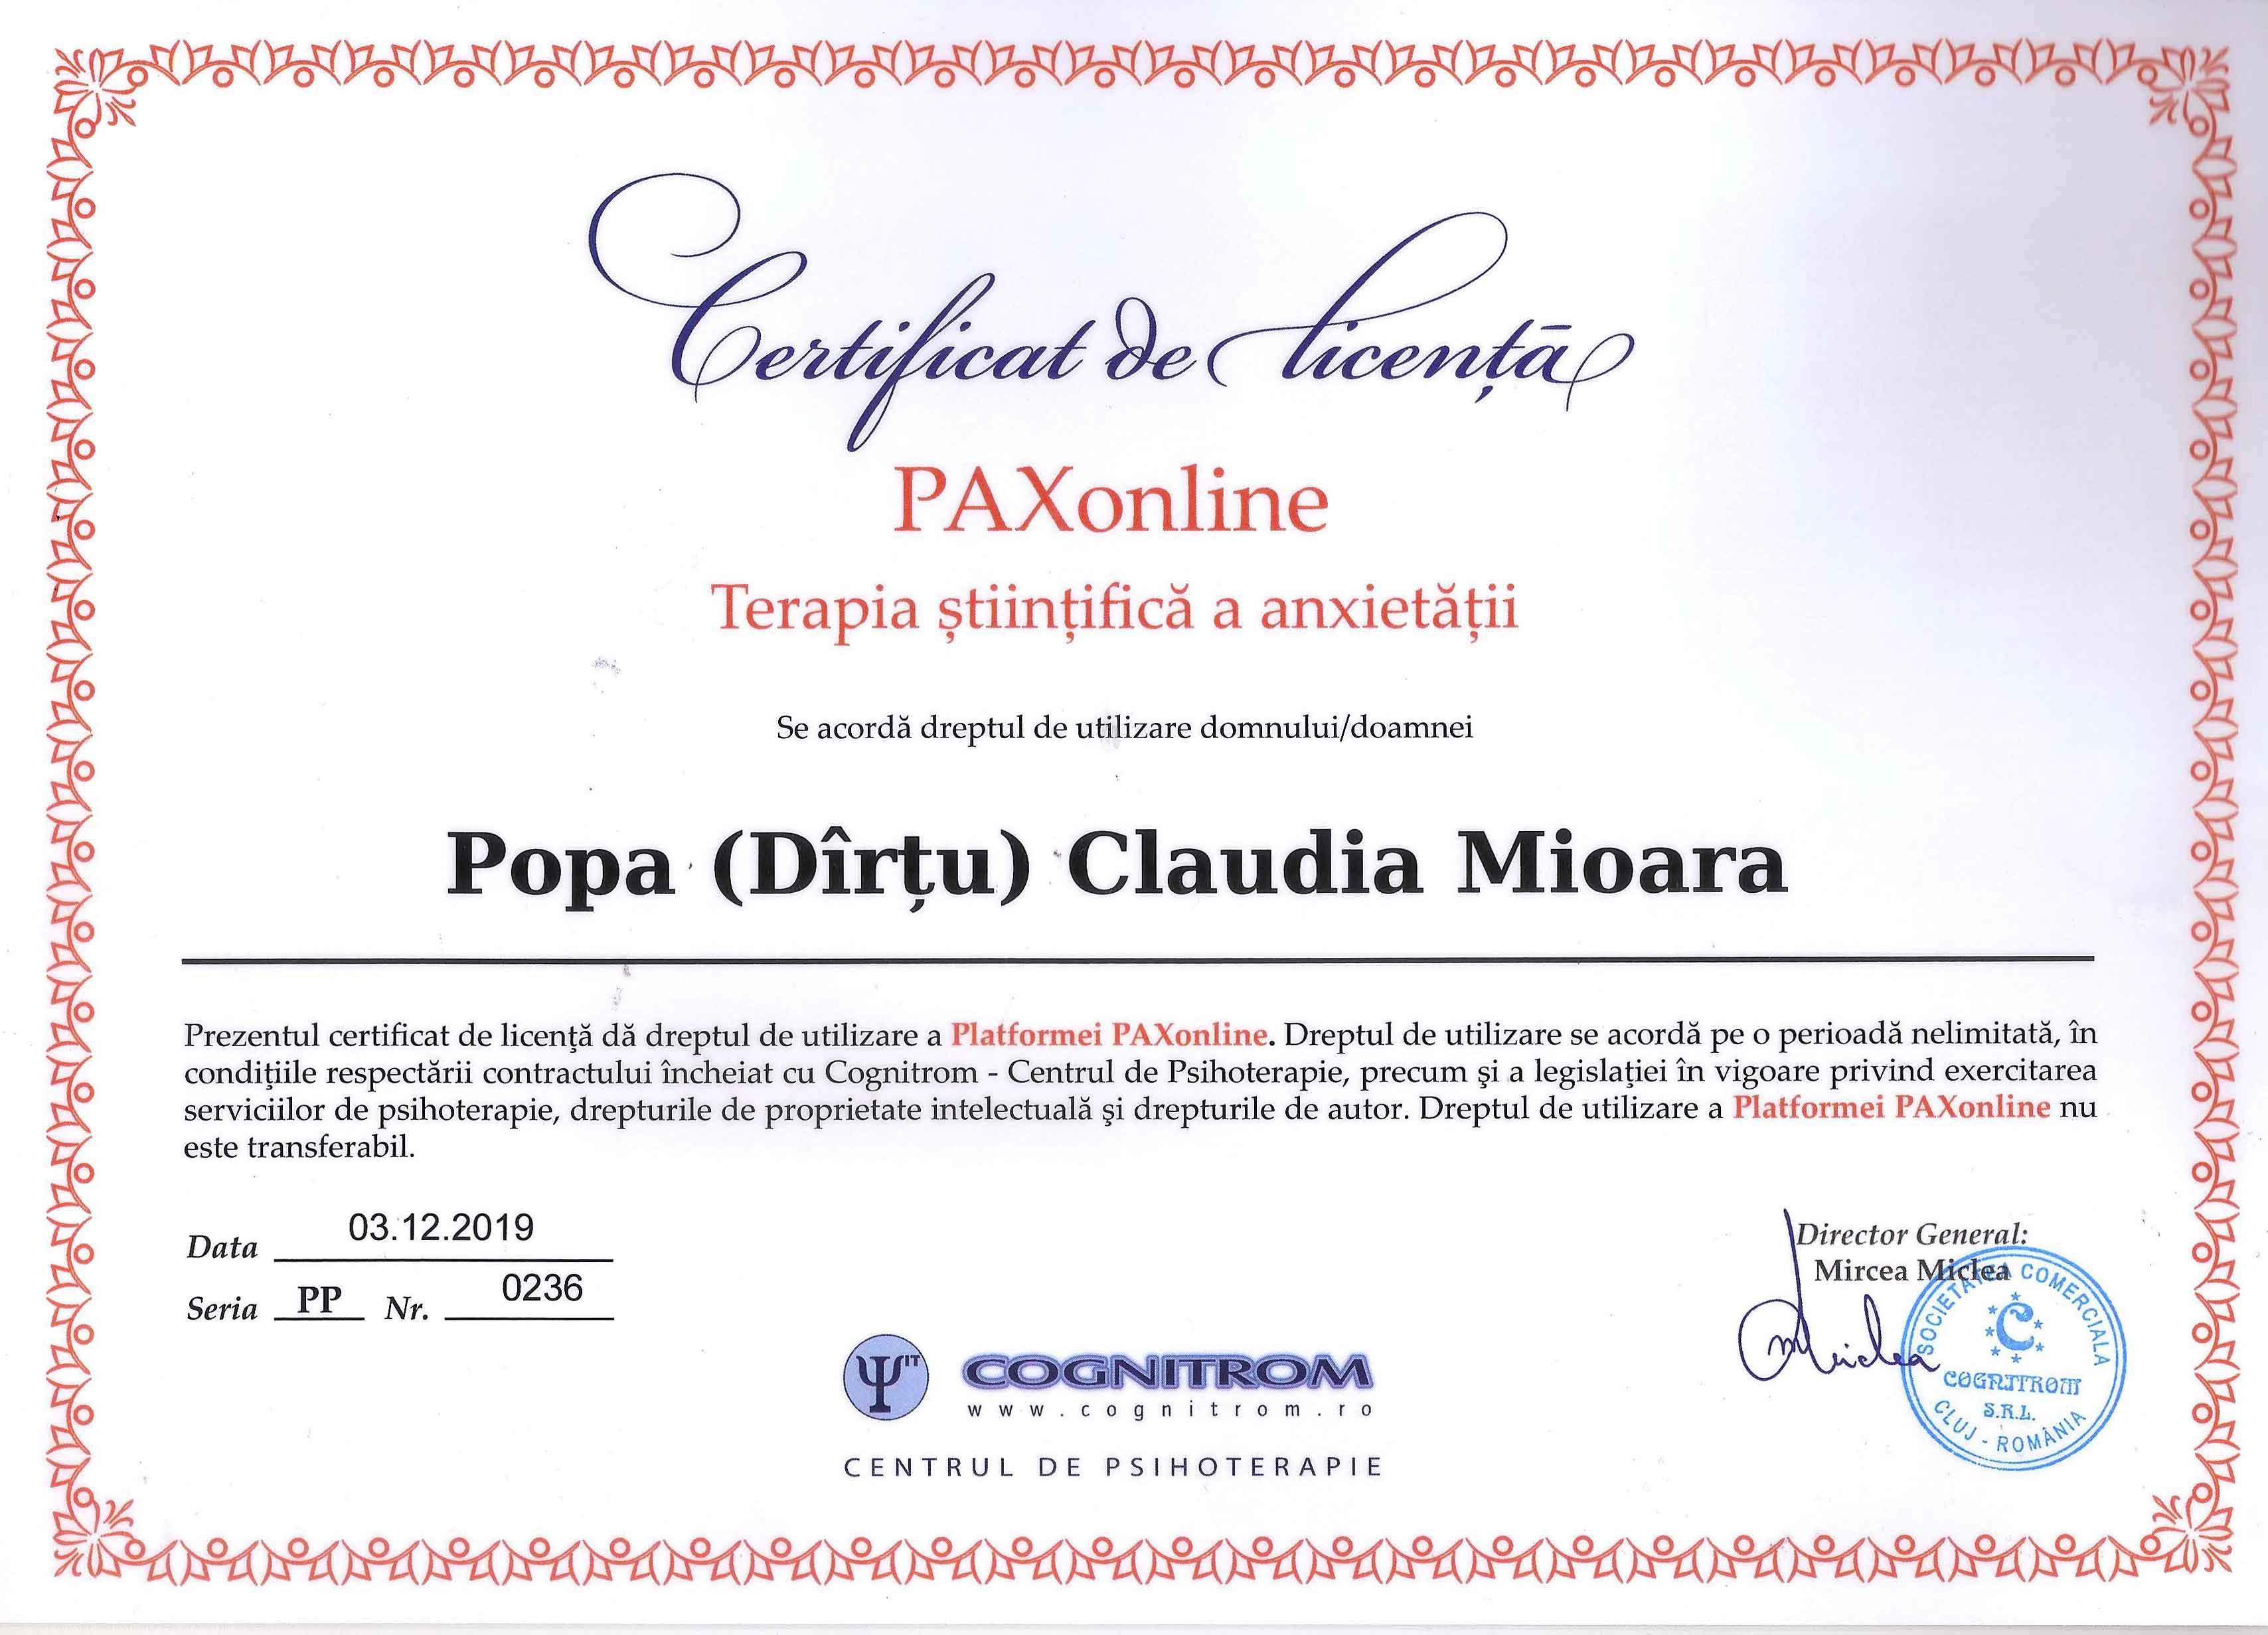 Certificat de licenta PAXonline Terapia stiintifica a anxietatii Popa Claudia Mioara